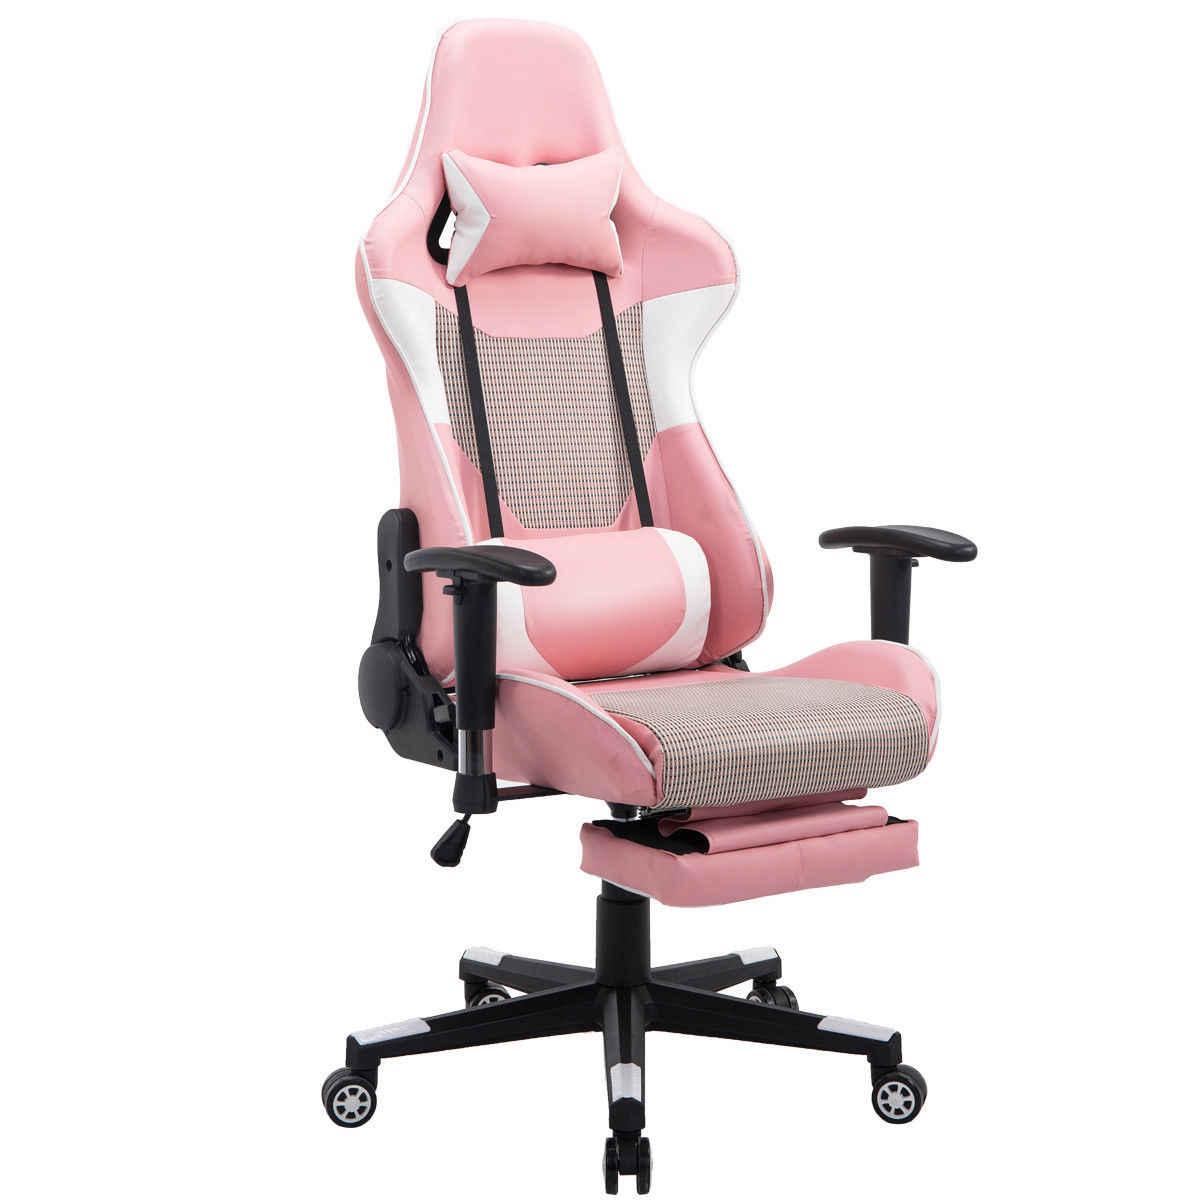 Terrific Giantex Modern Reclining Gaming Chair High Back Racing Evergreenethics Interior Chair Design Evergreenethicsorg